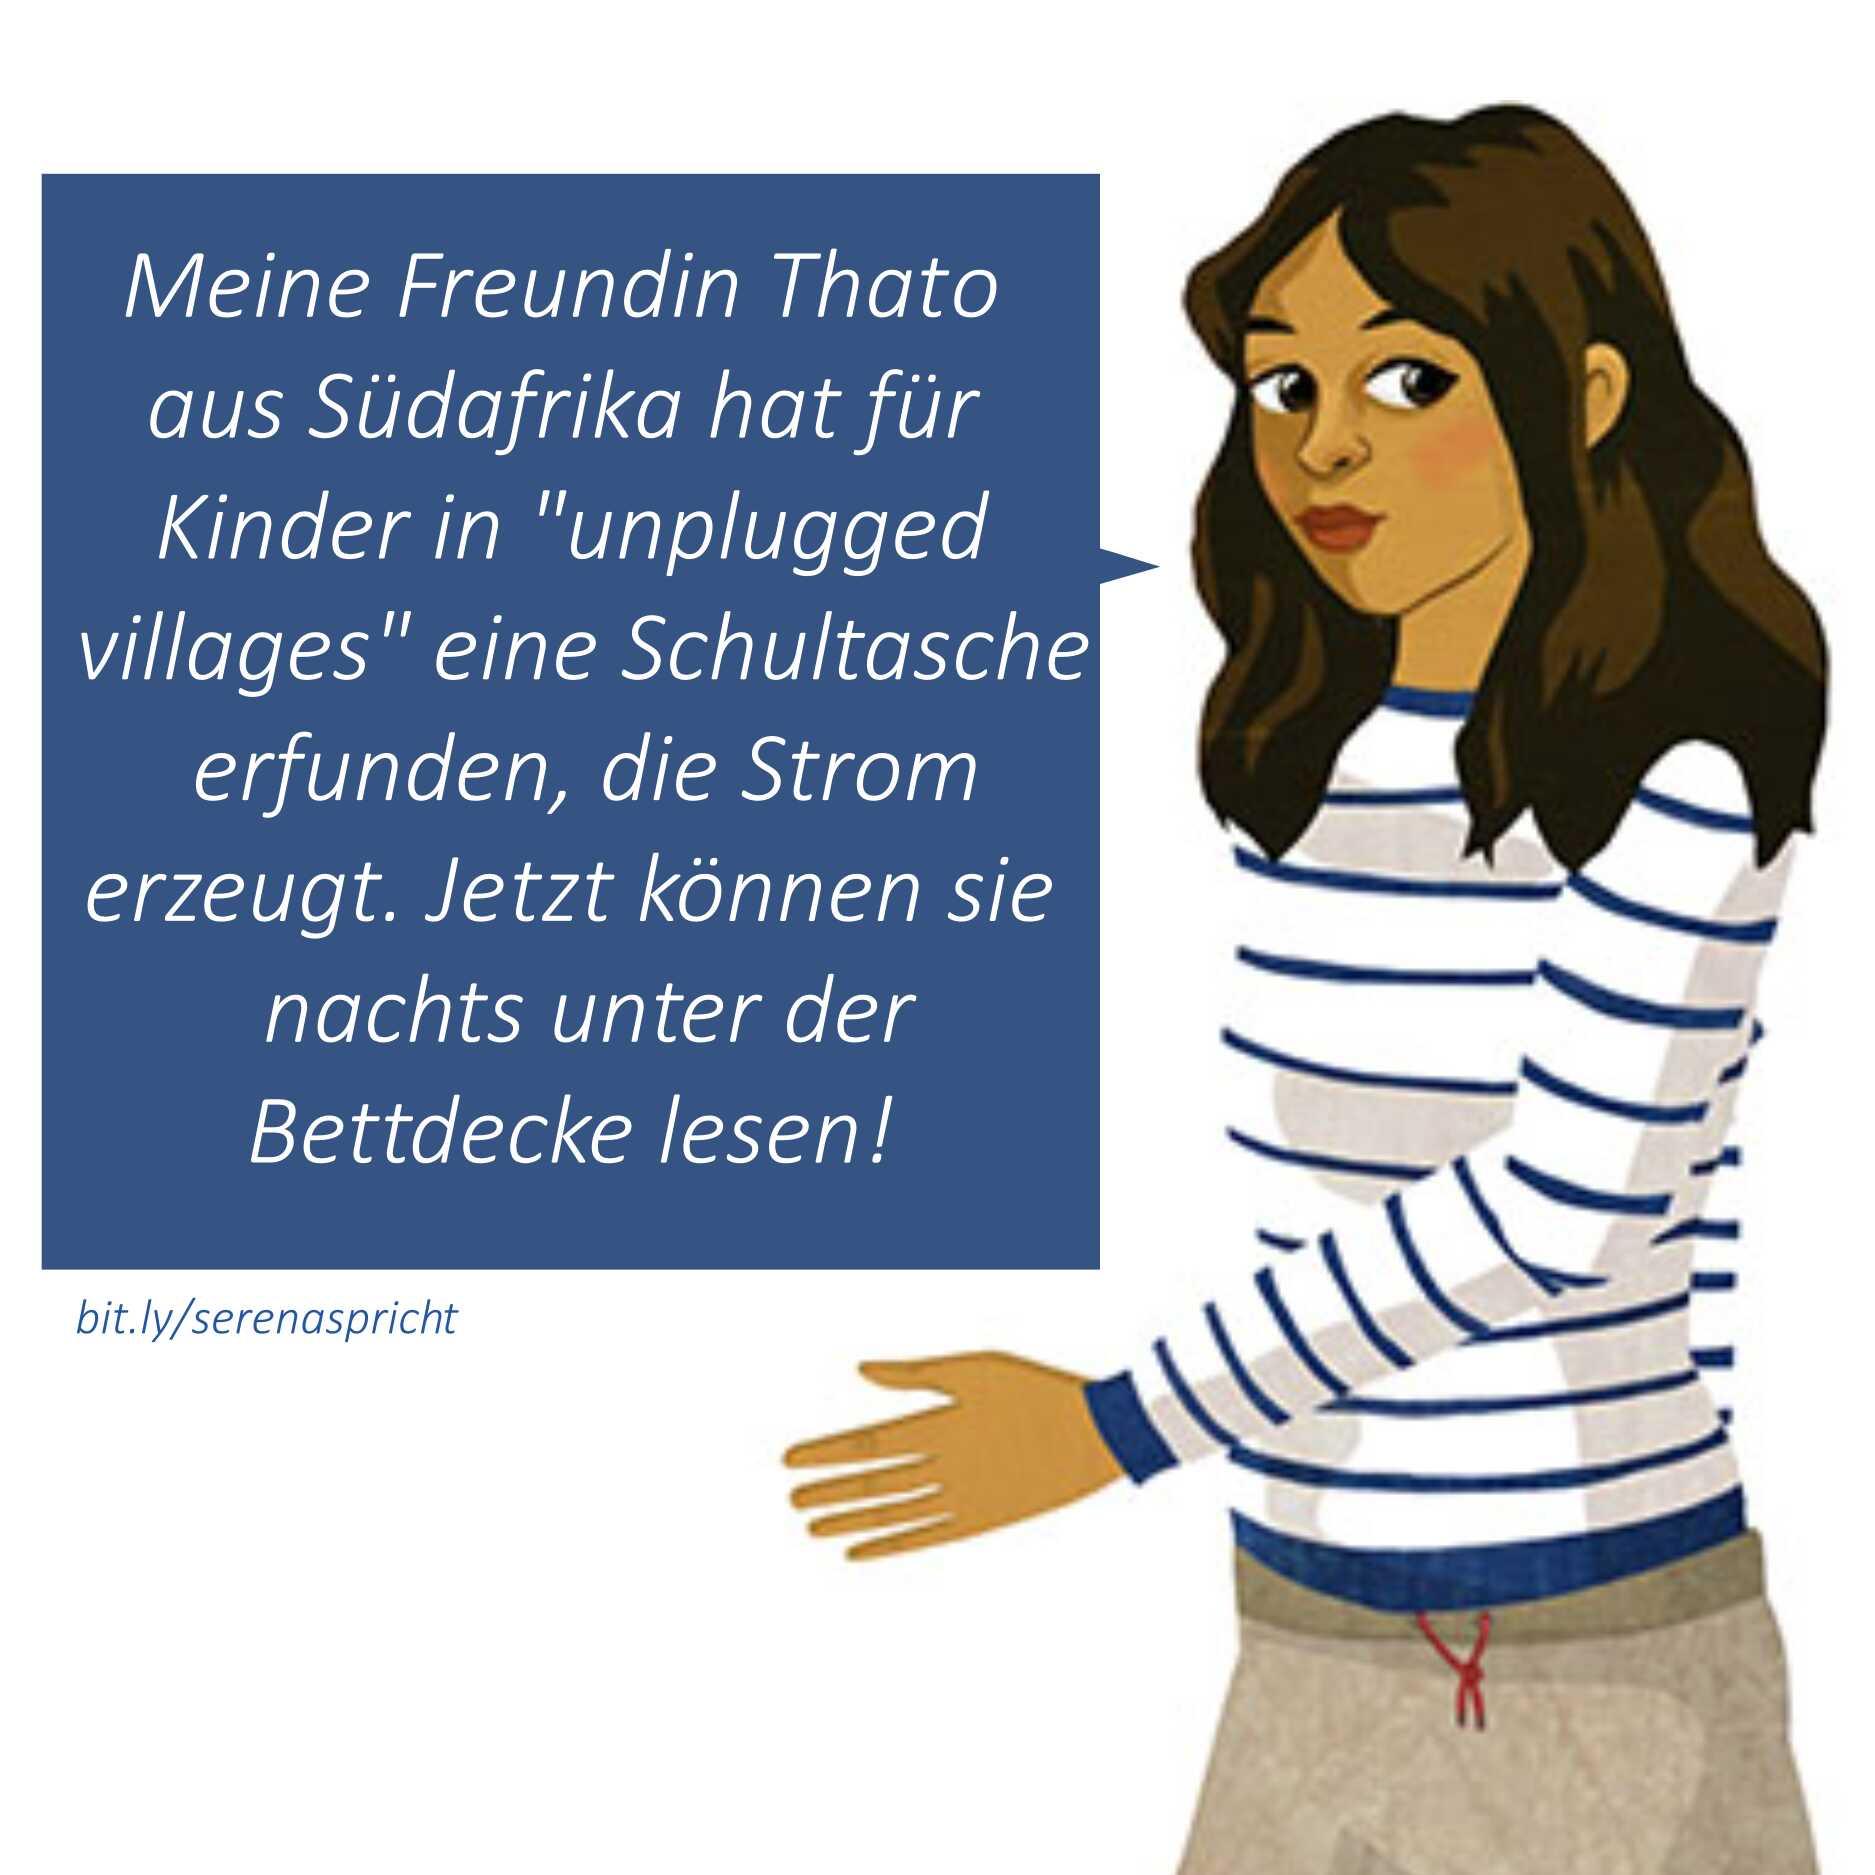 Serena-Comic_Schultasche